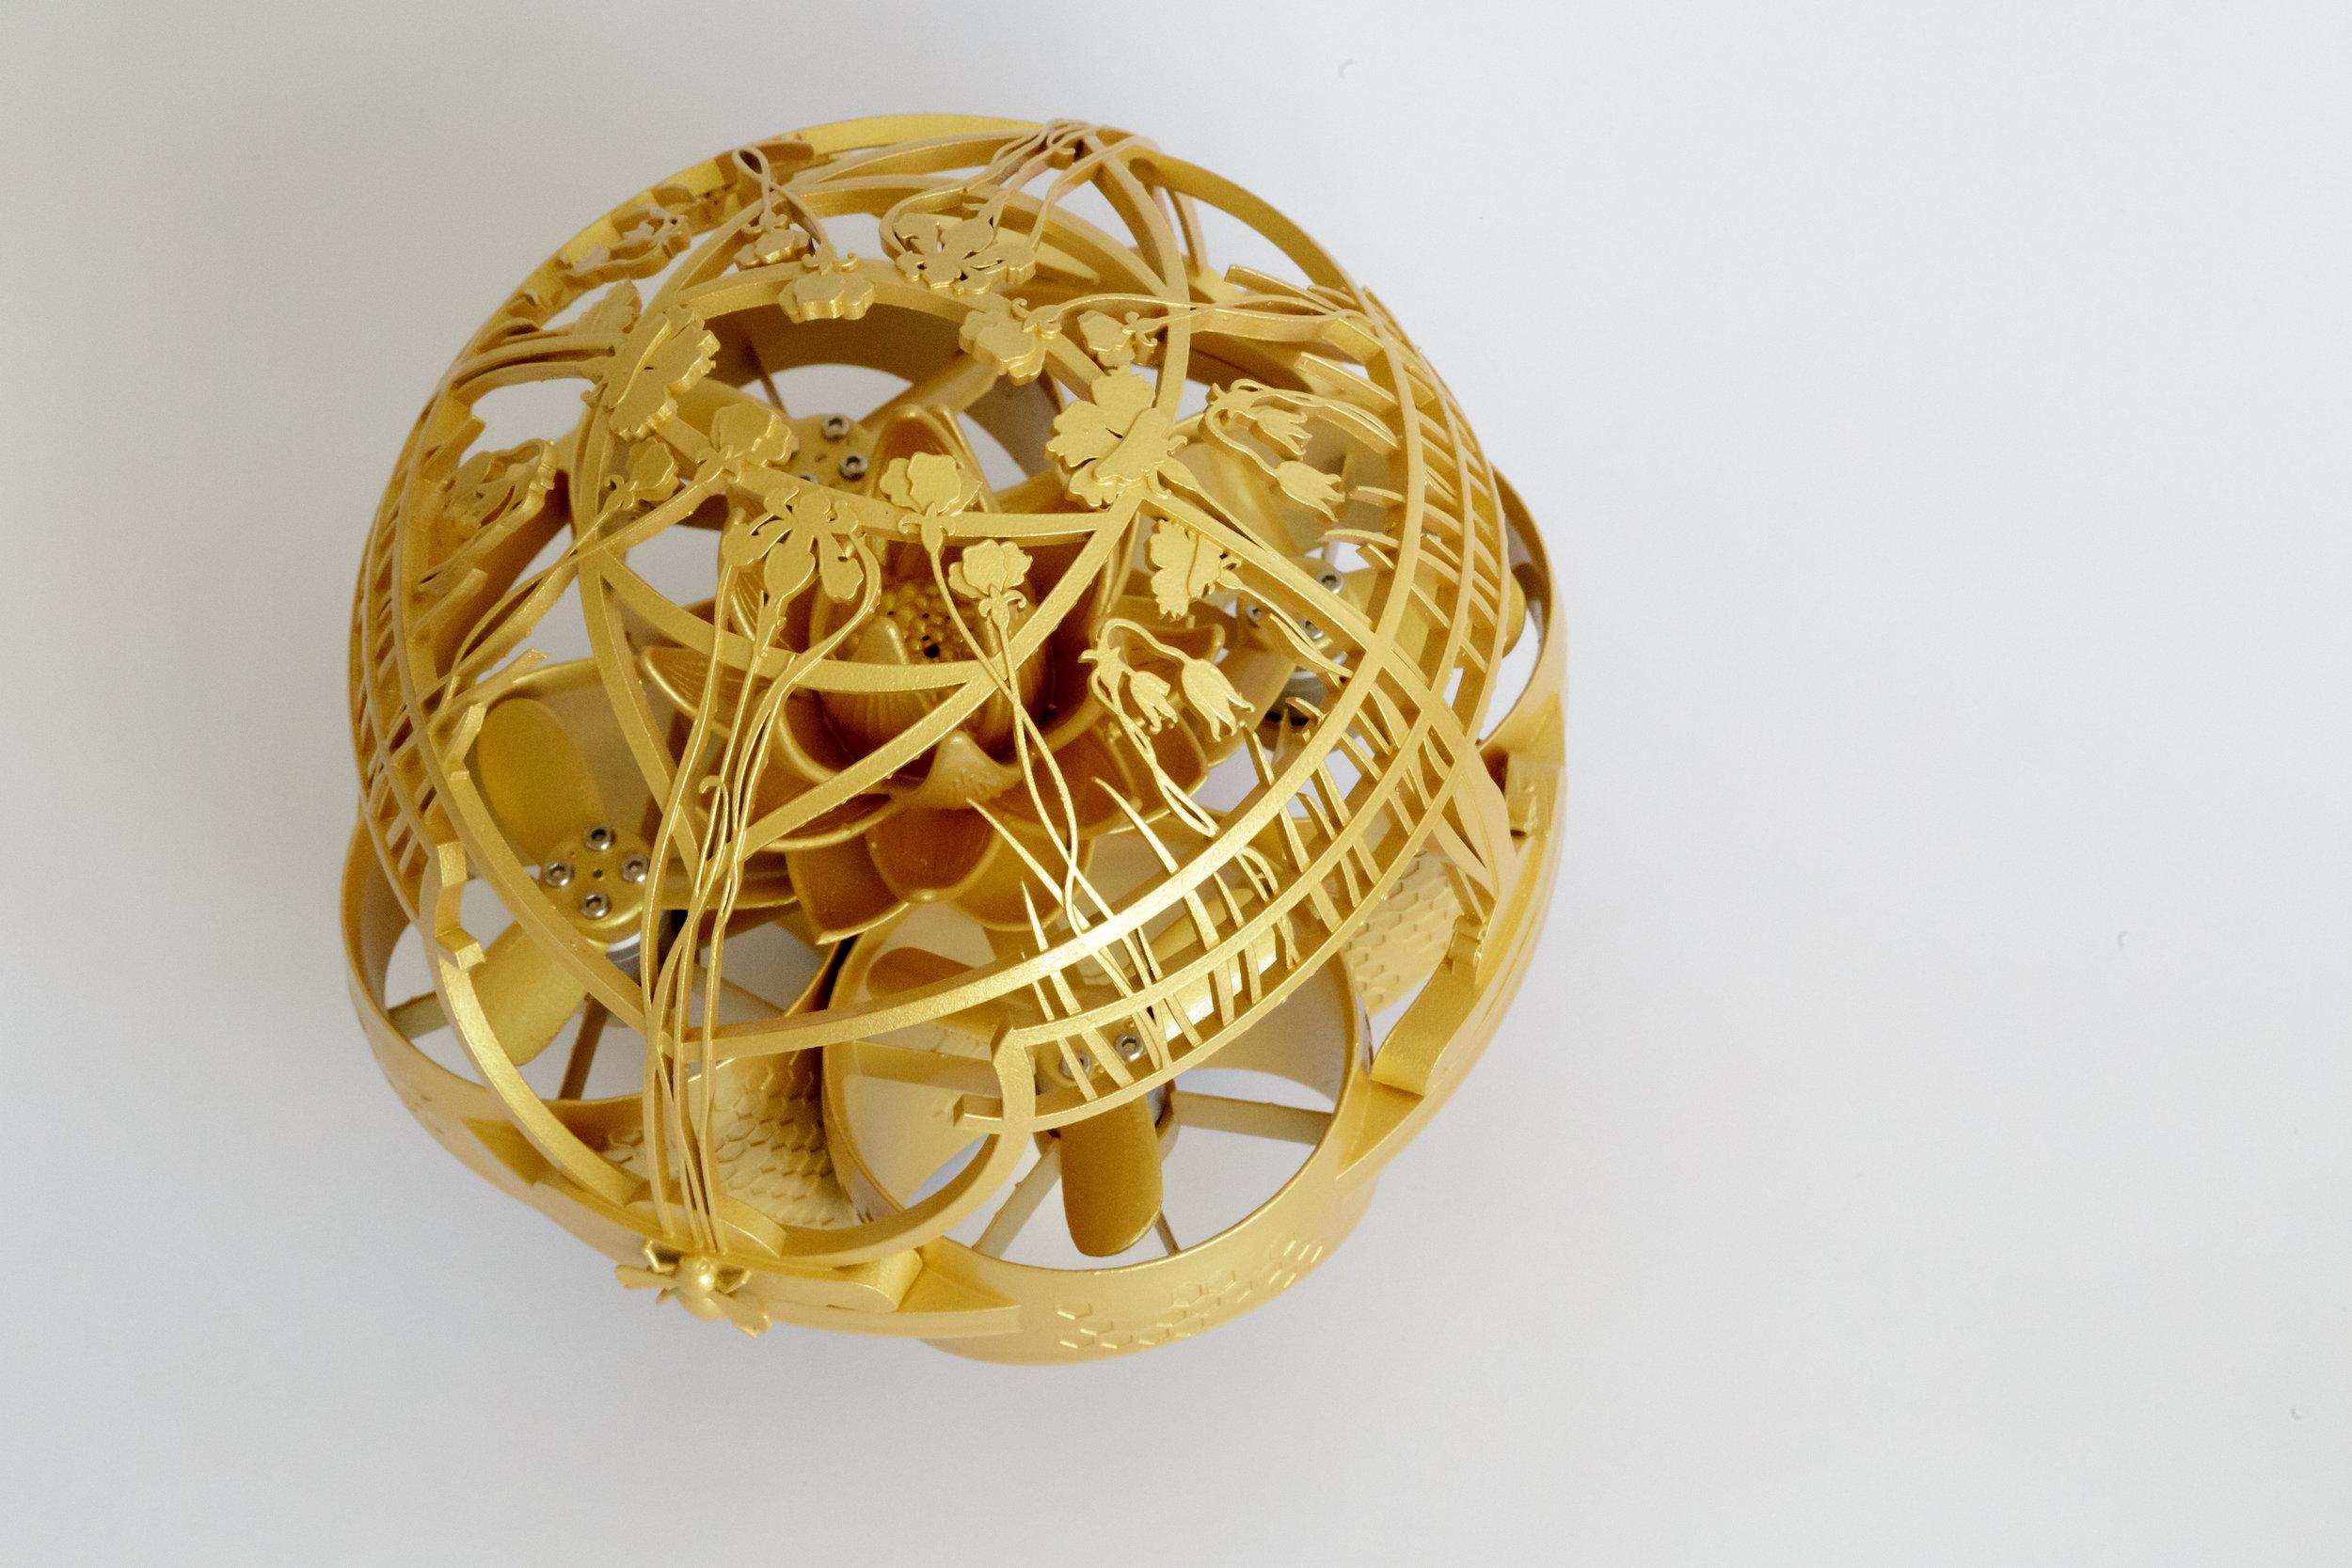 Gold Drone v2